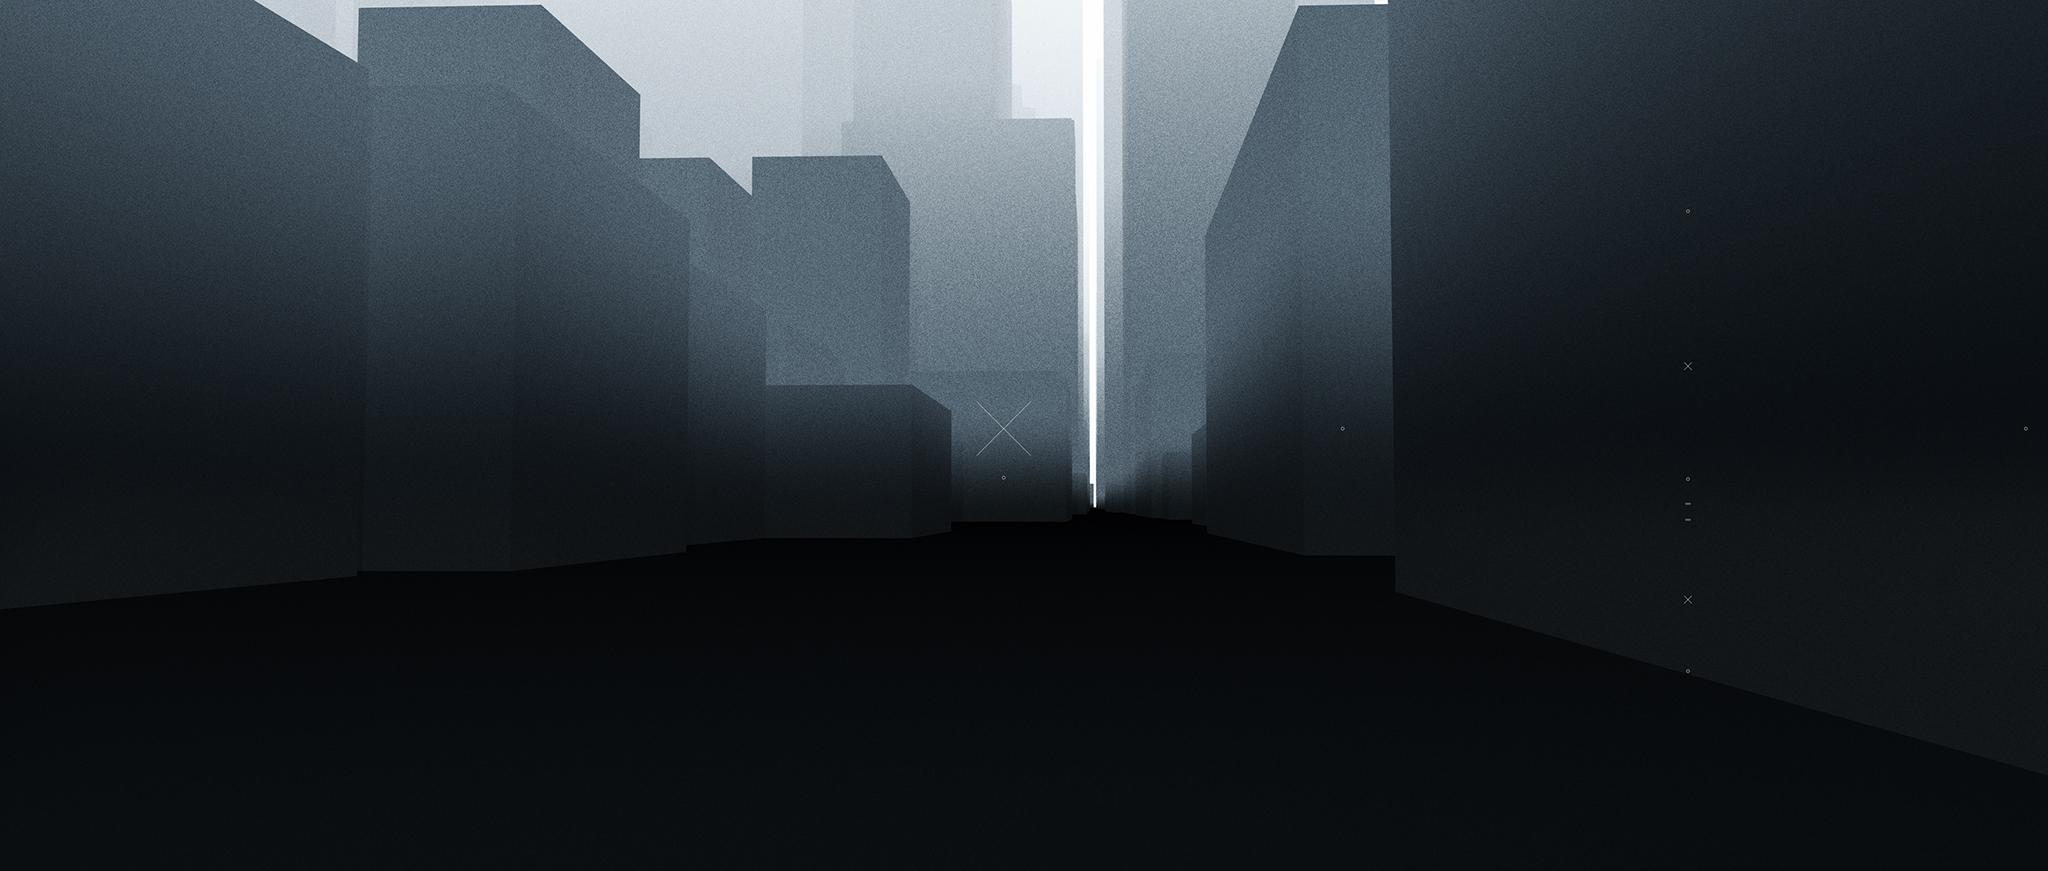 City_Dev_01.jpg